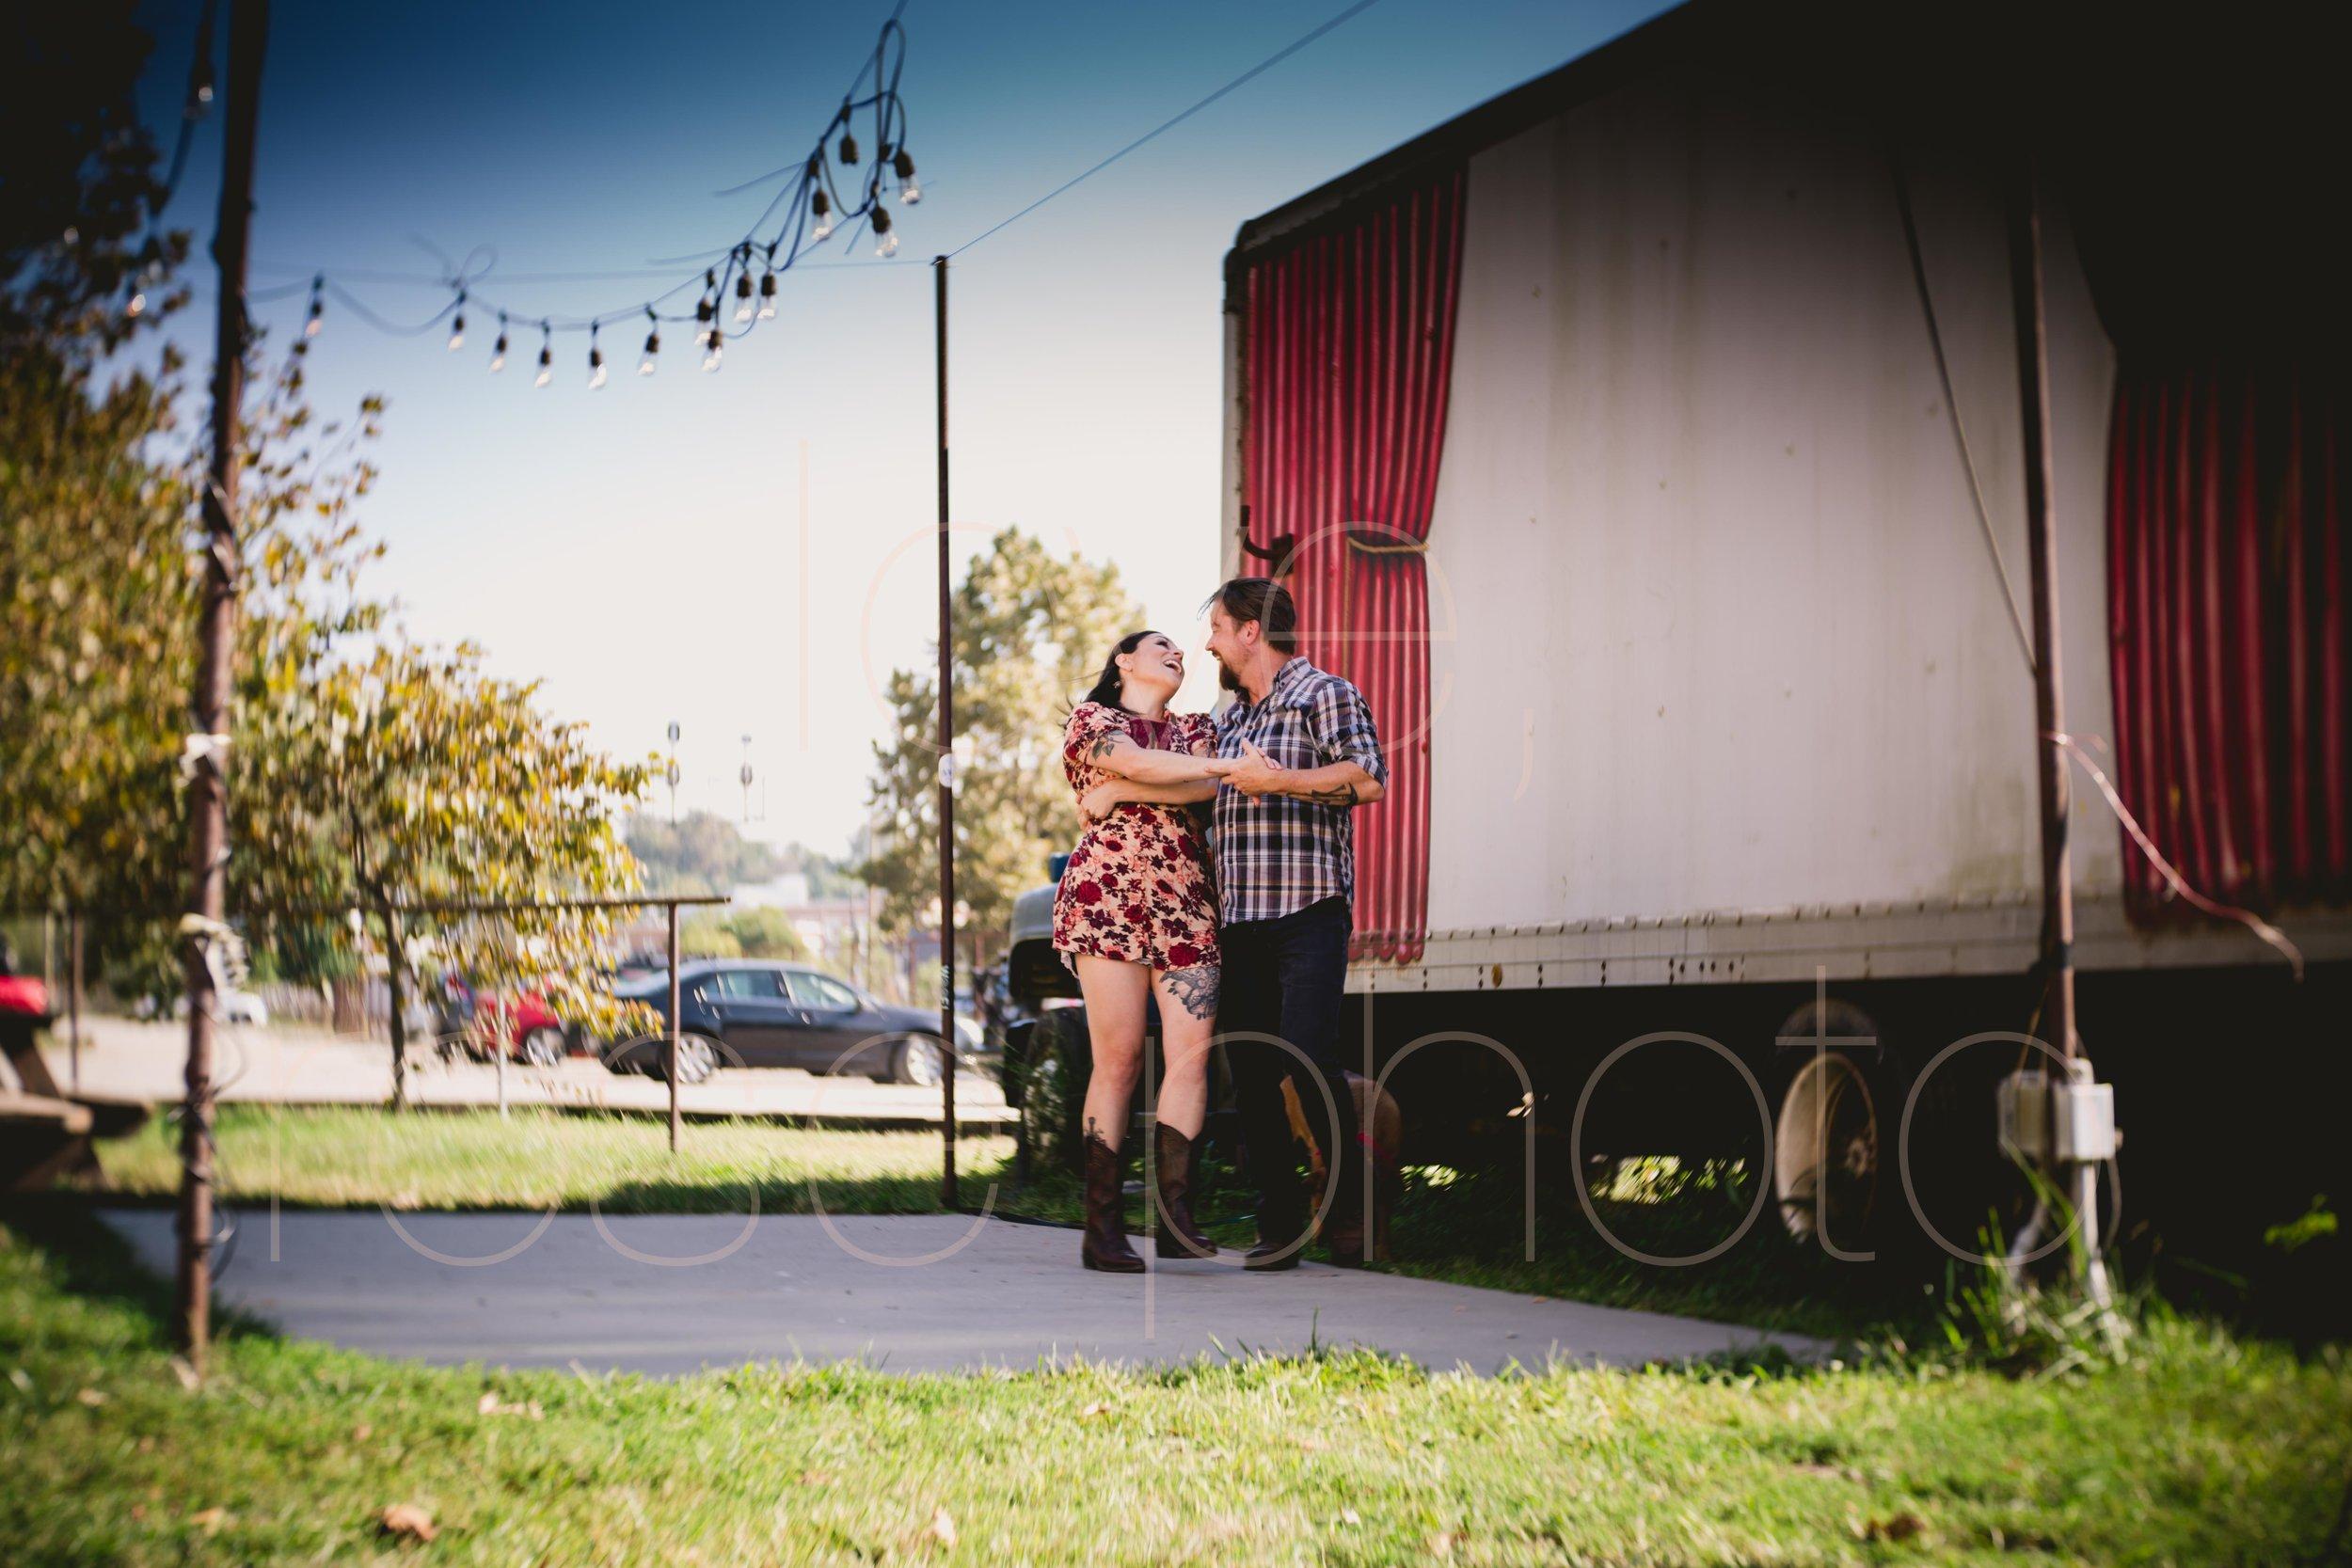 Jane Kramer Ashevegas Jason Sanford WNC Asheville wedding engagement shoot by Rose Photo-9.jpg